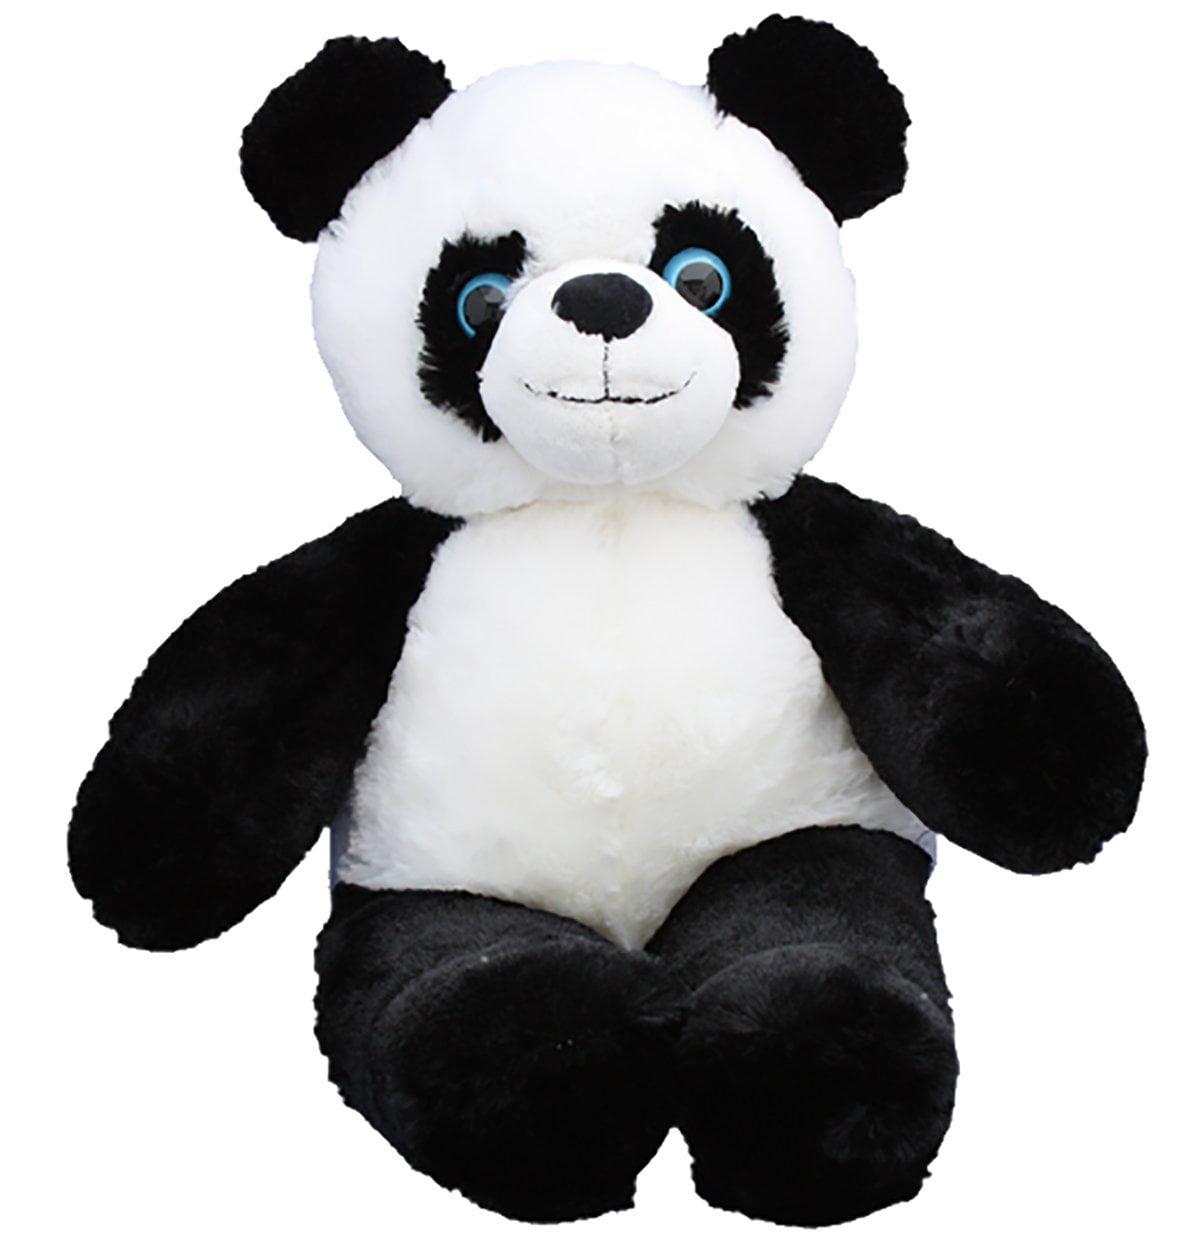 Cuddly Soft 16 inch Stuffed Panda Bear - We stuff 'em...you love 'em!